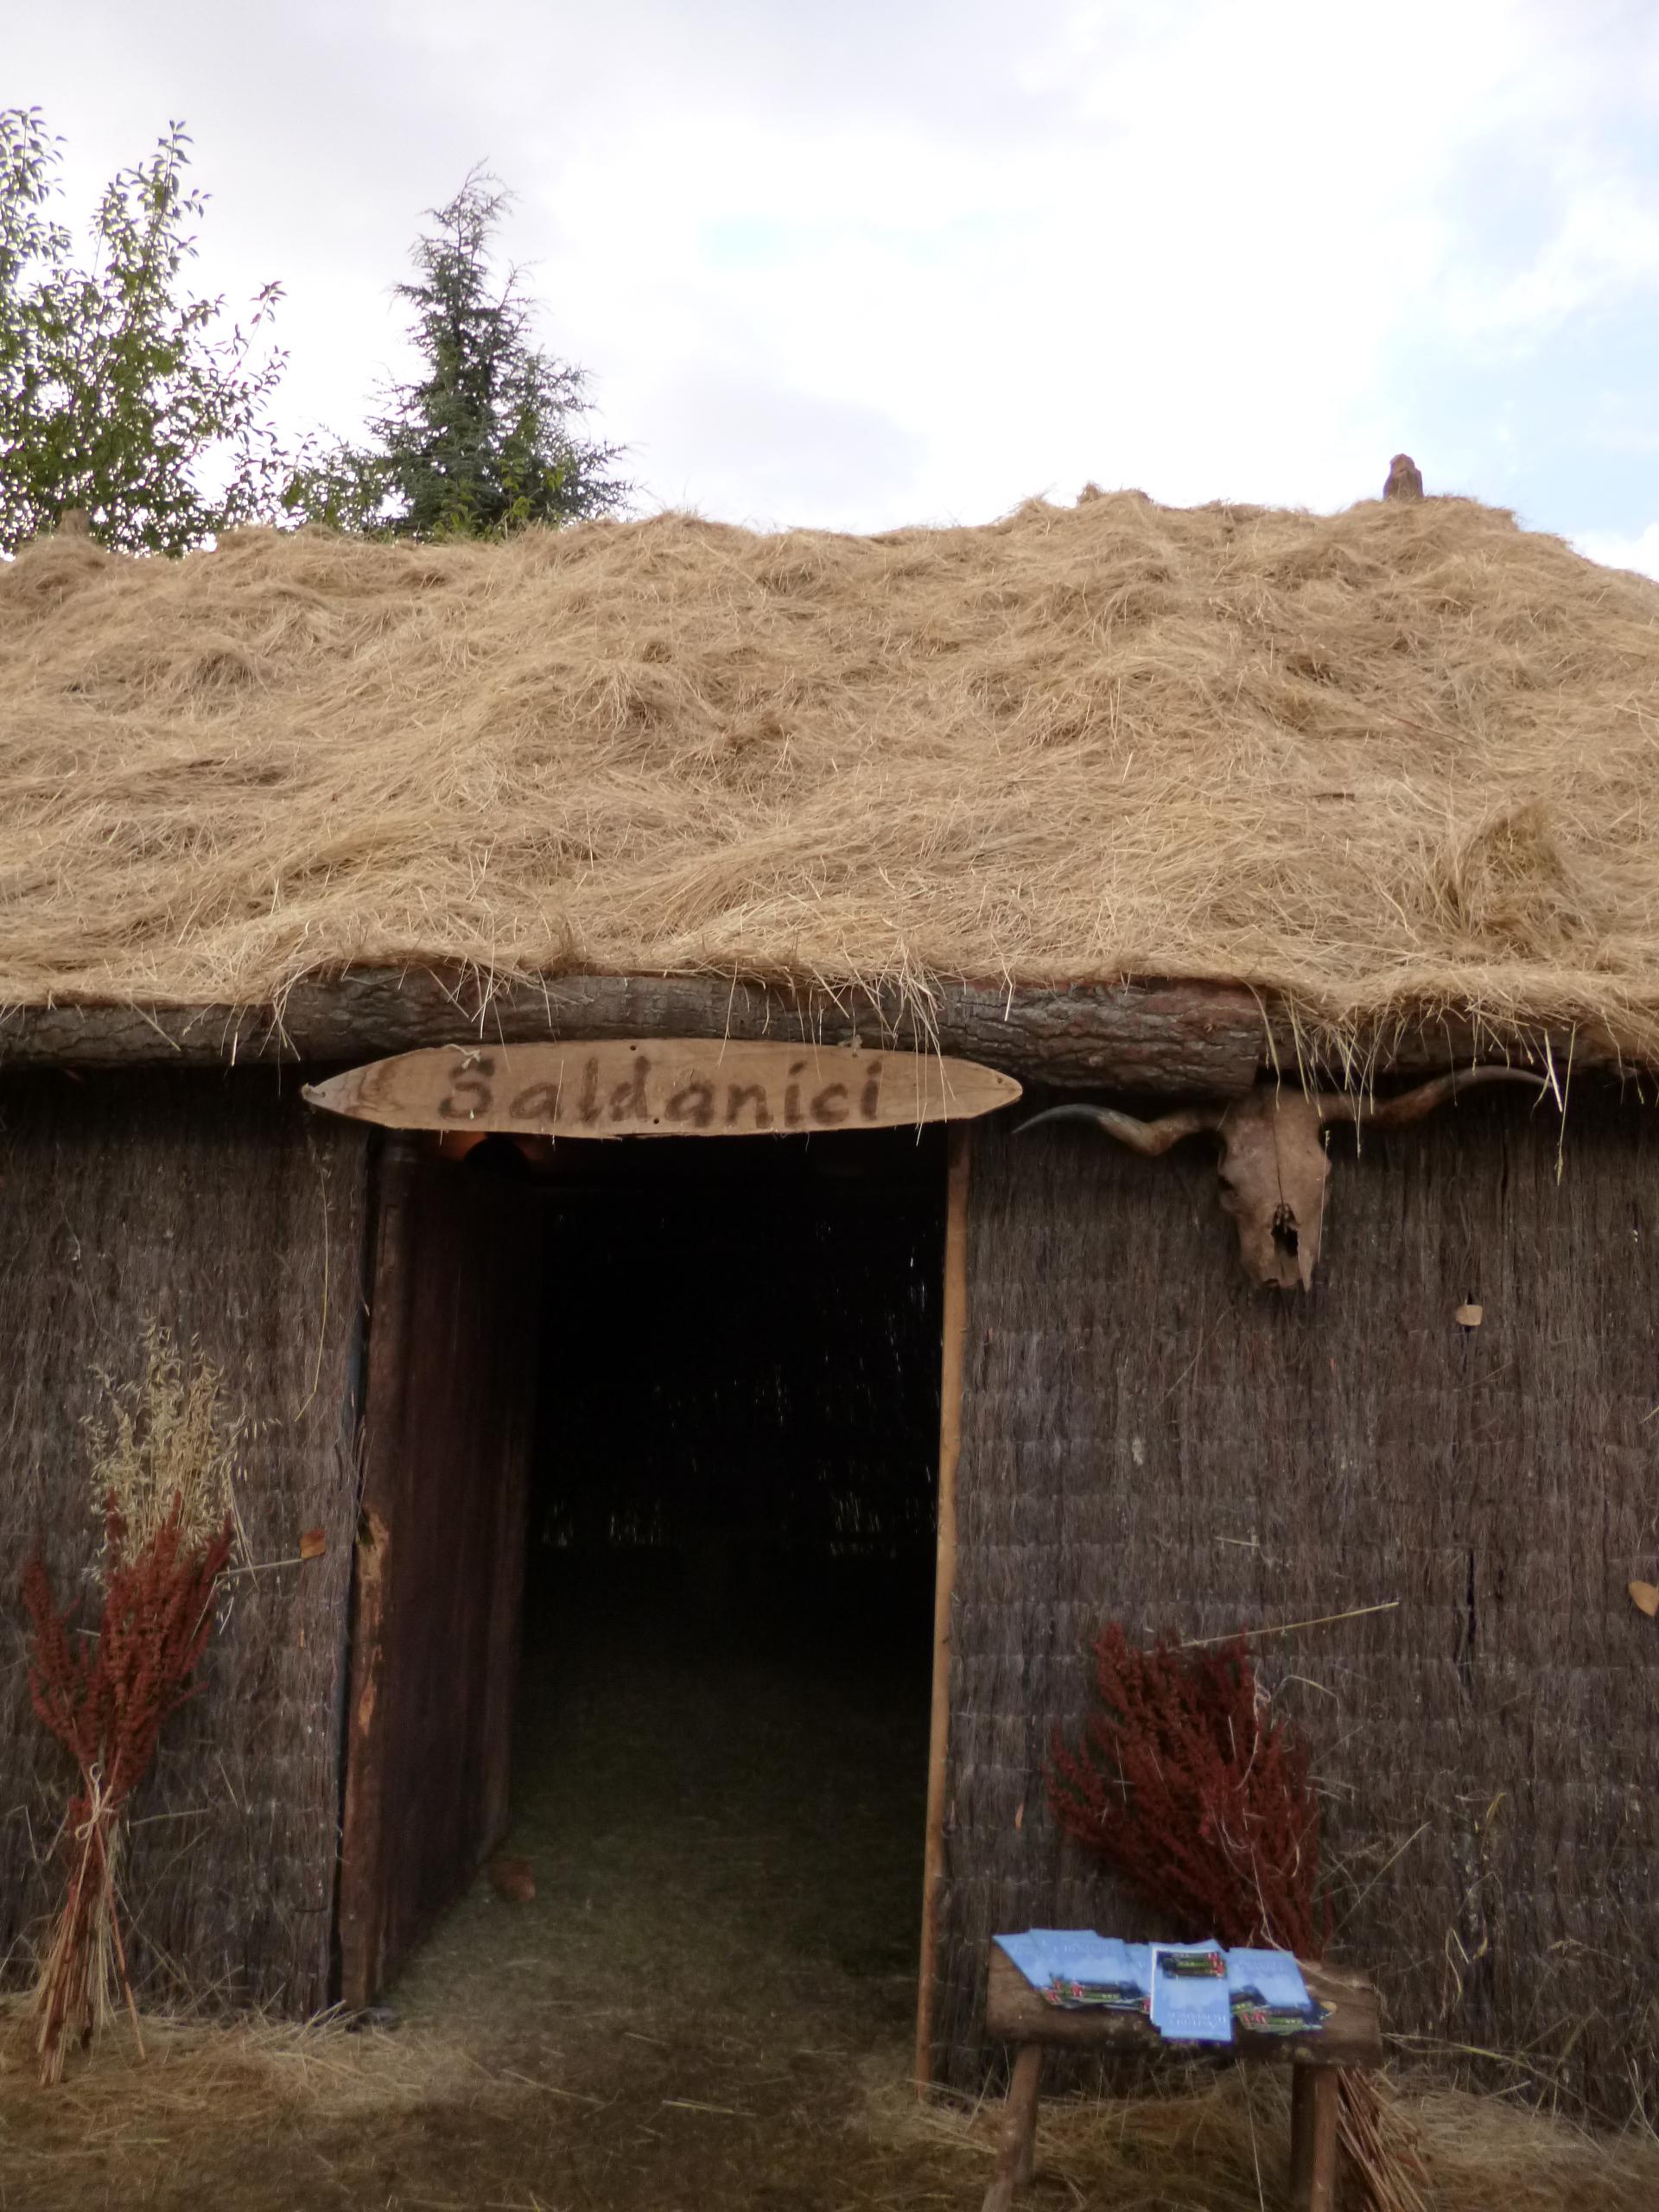 Cabaña de la tribu Saldanici en el campamento Astur #325D99 1920x2560